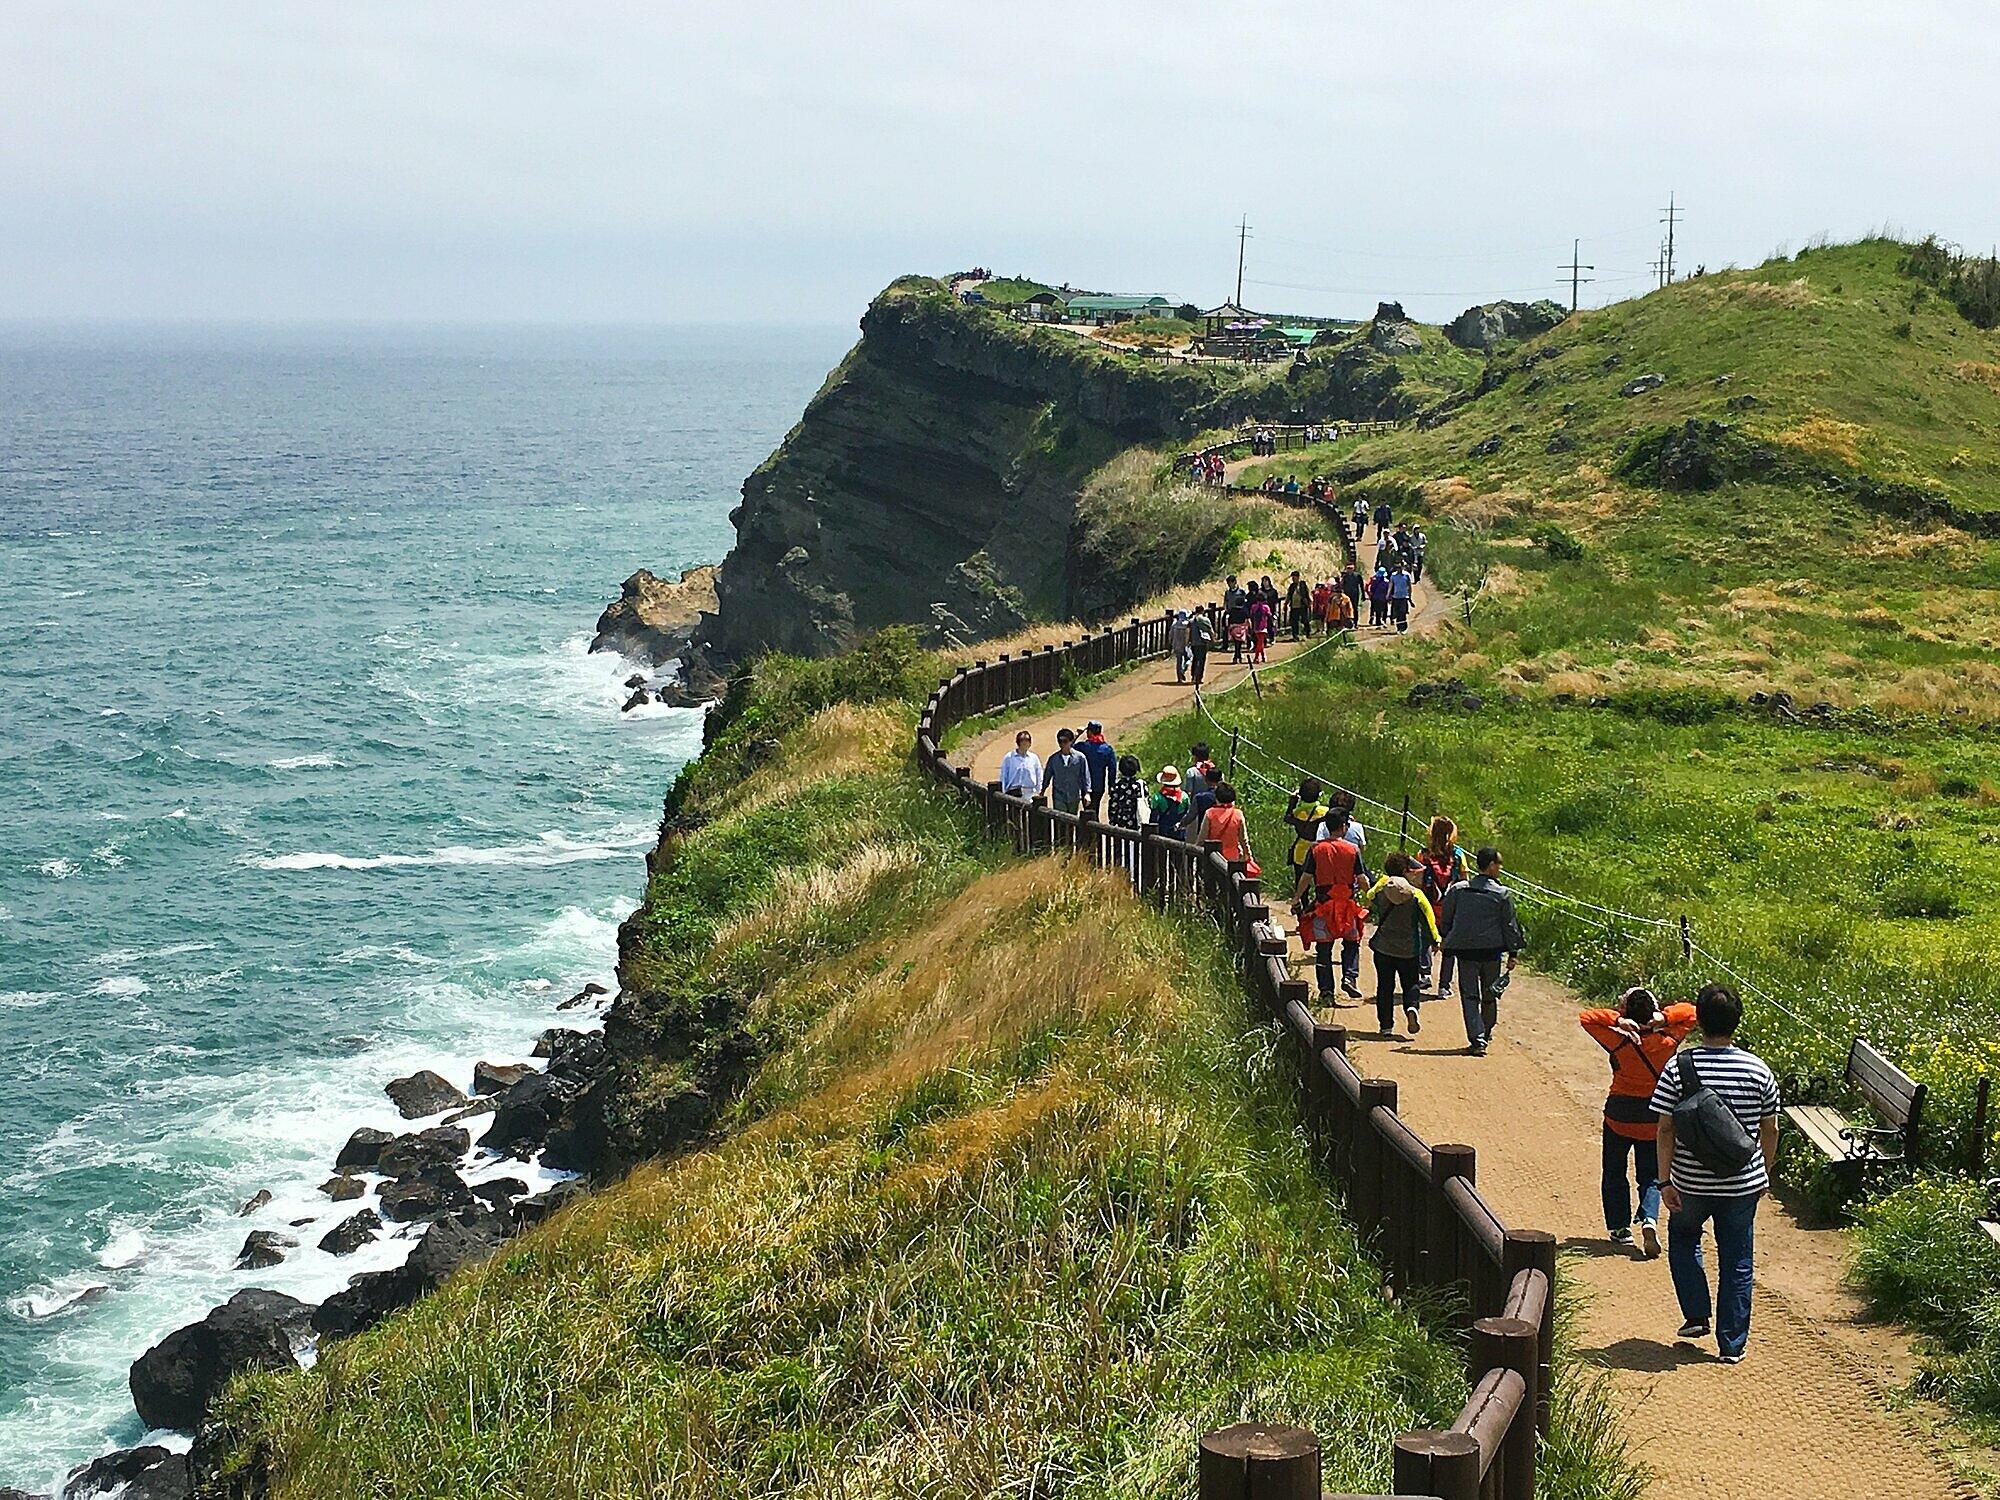 Tuyến đi bộ Songaksan Dullegil ở đảo Jeju. Ảnh: Shutterstock